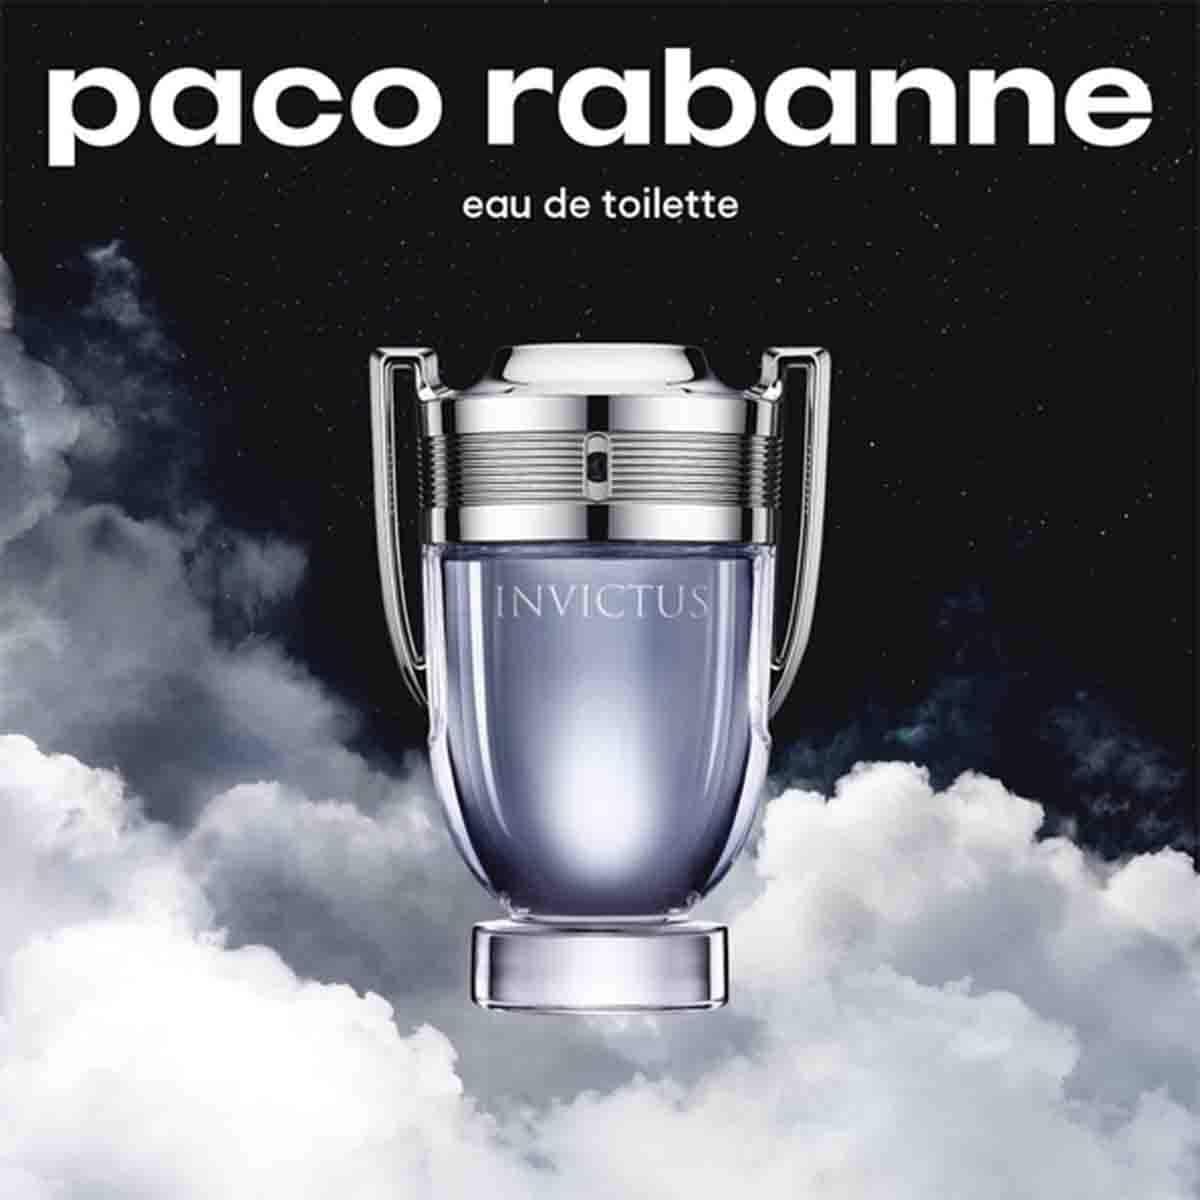 Fragancia para Caballero Paco Rabanne Invictus Edt 100Ml